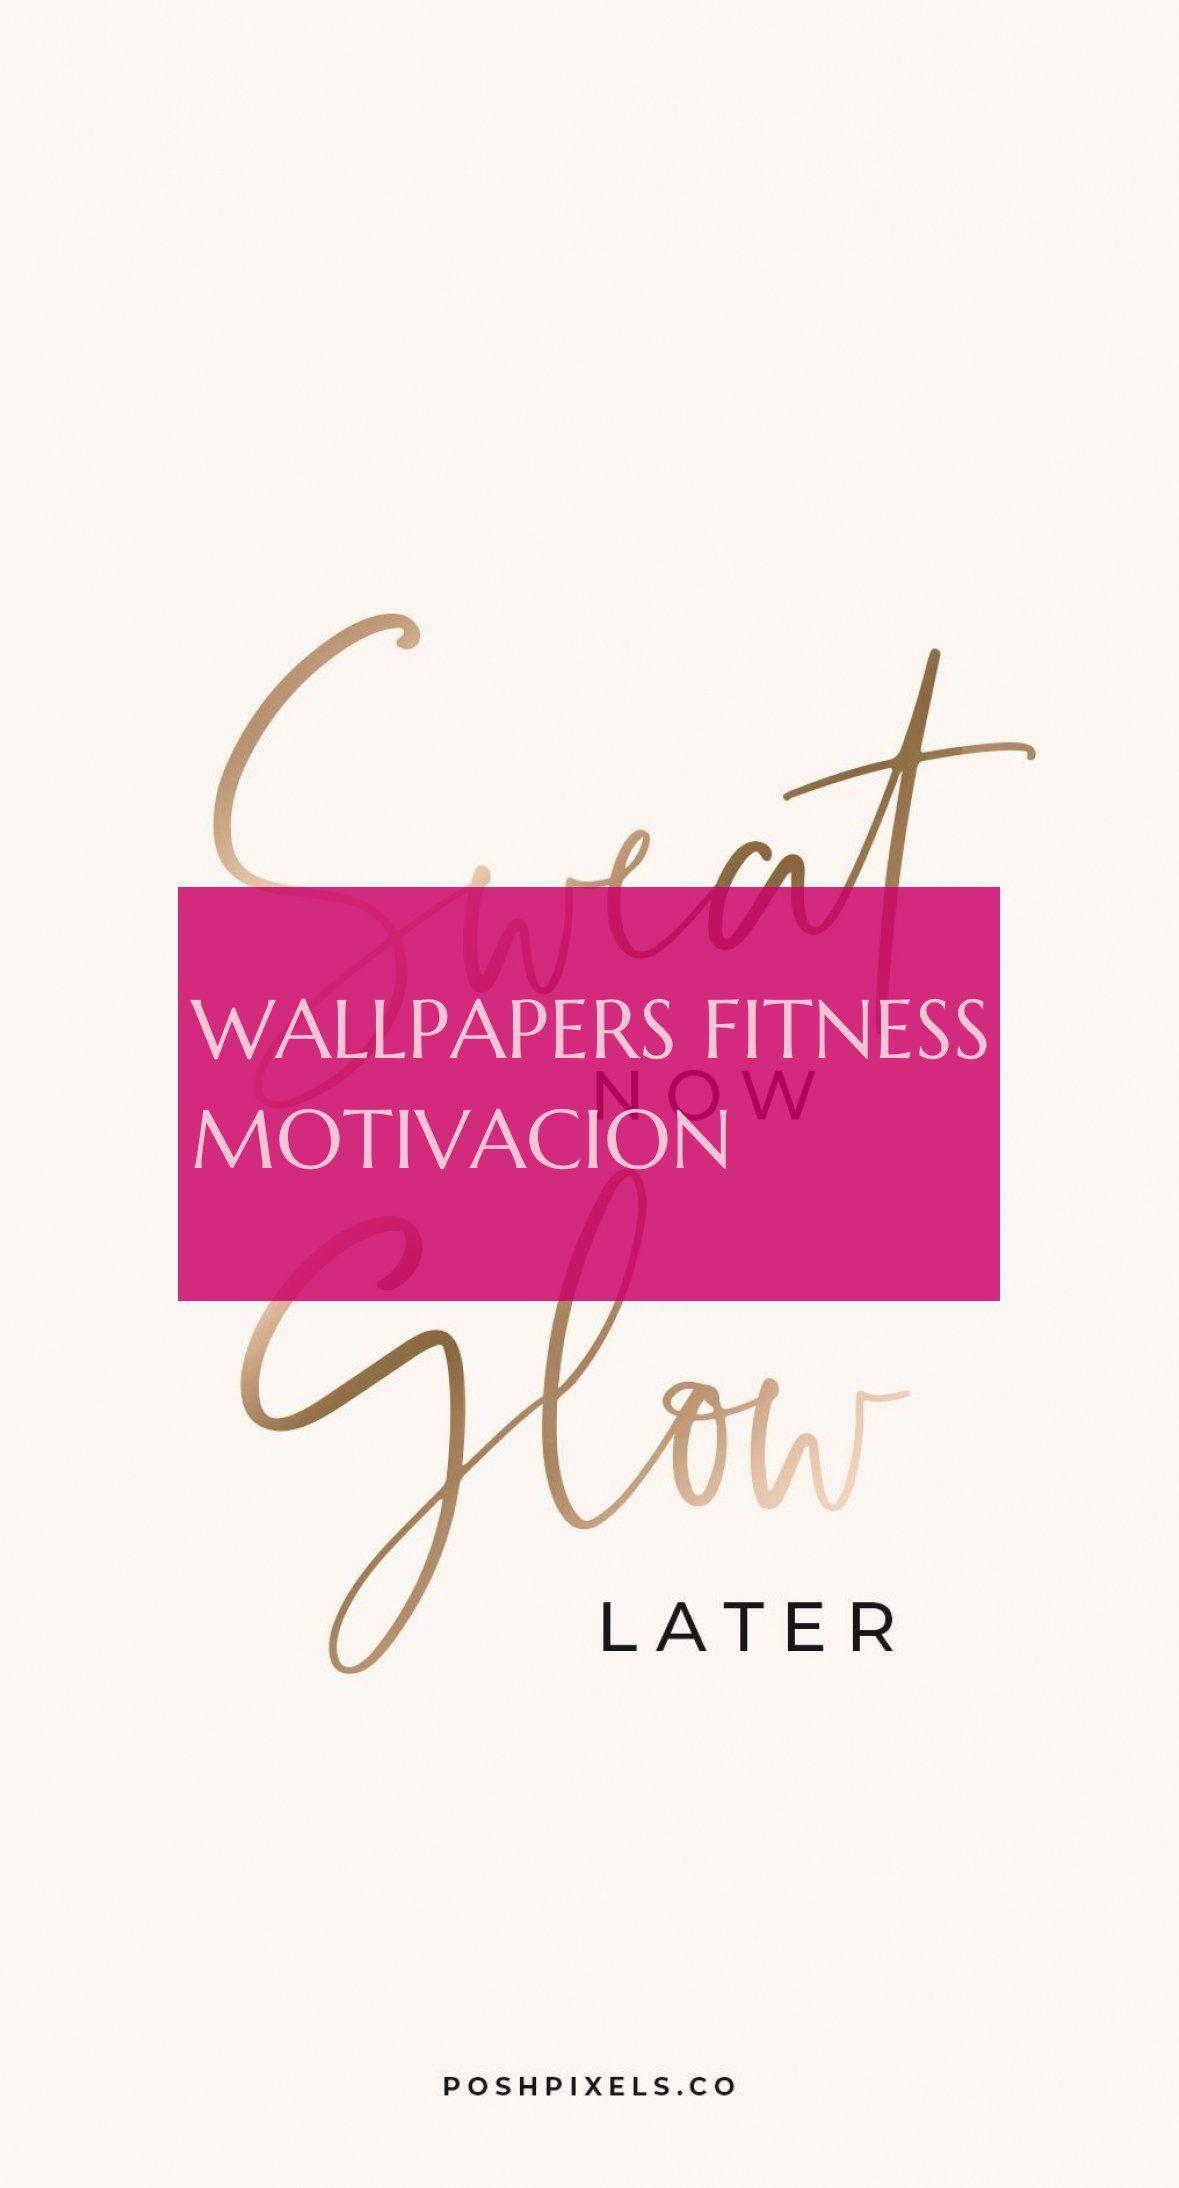 wallpapers fitness motivacion #wallpapers #fitness #motivacion